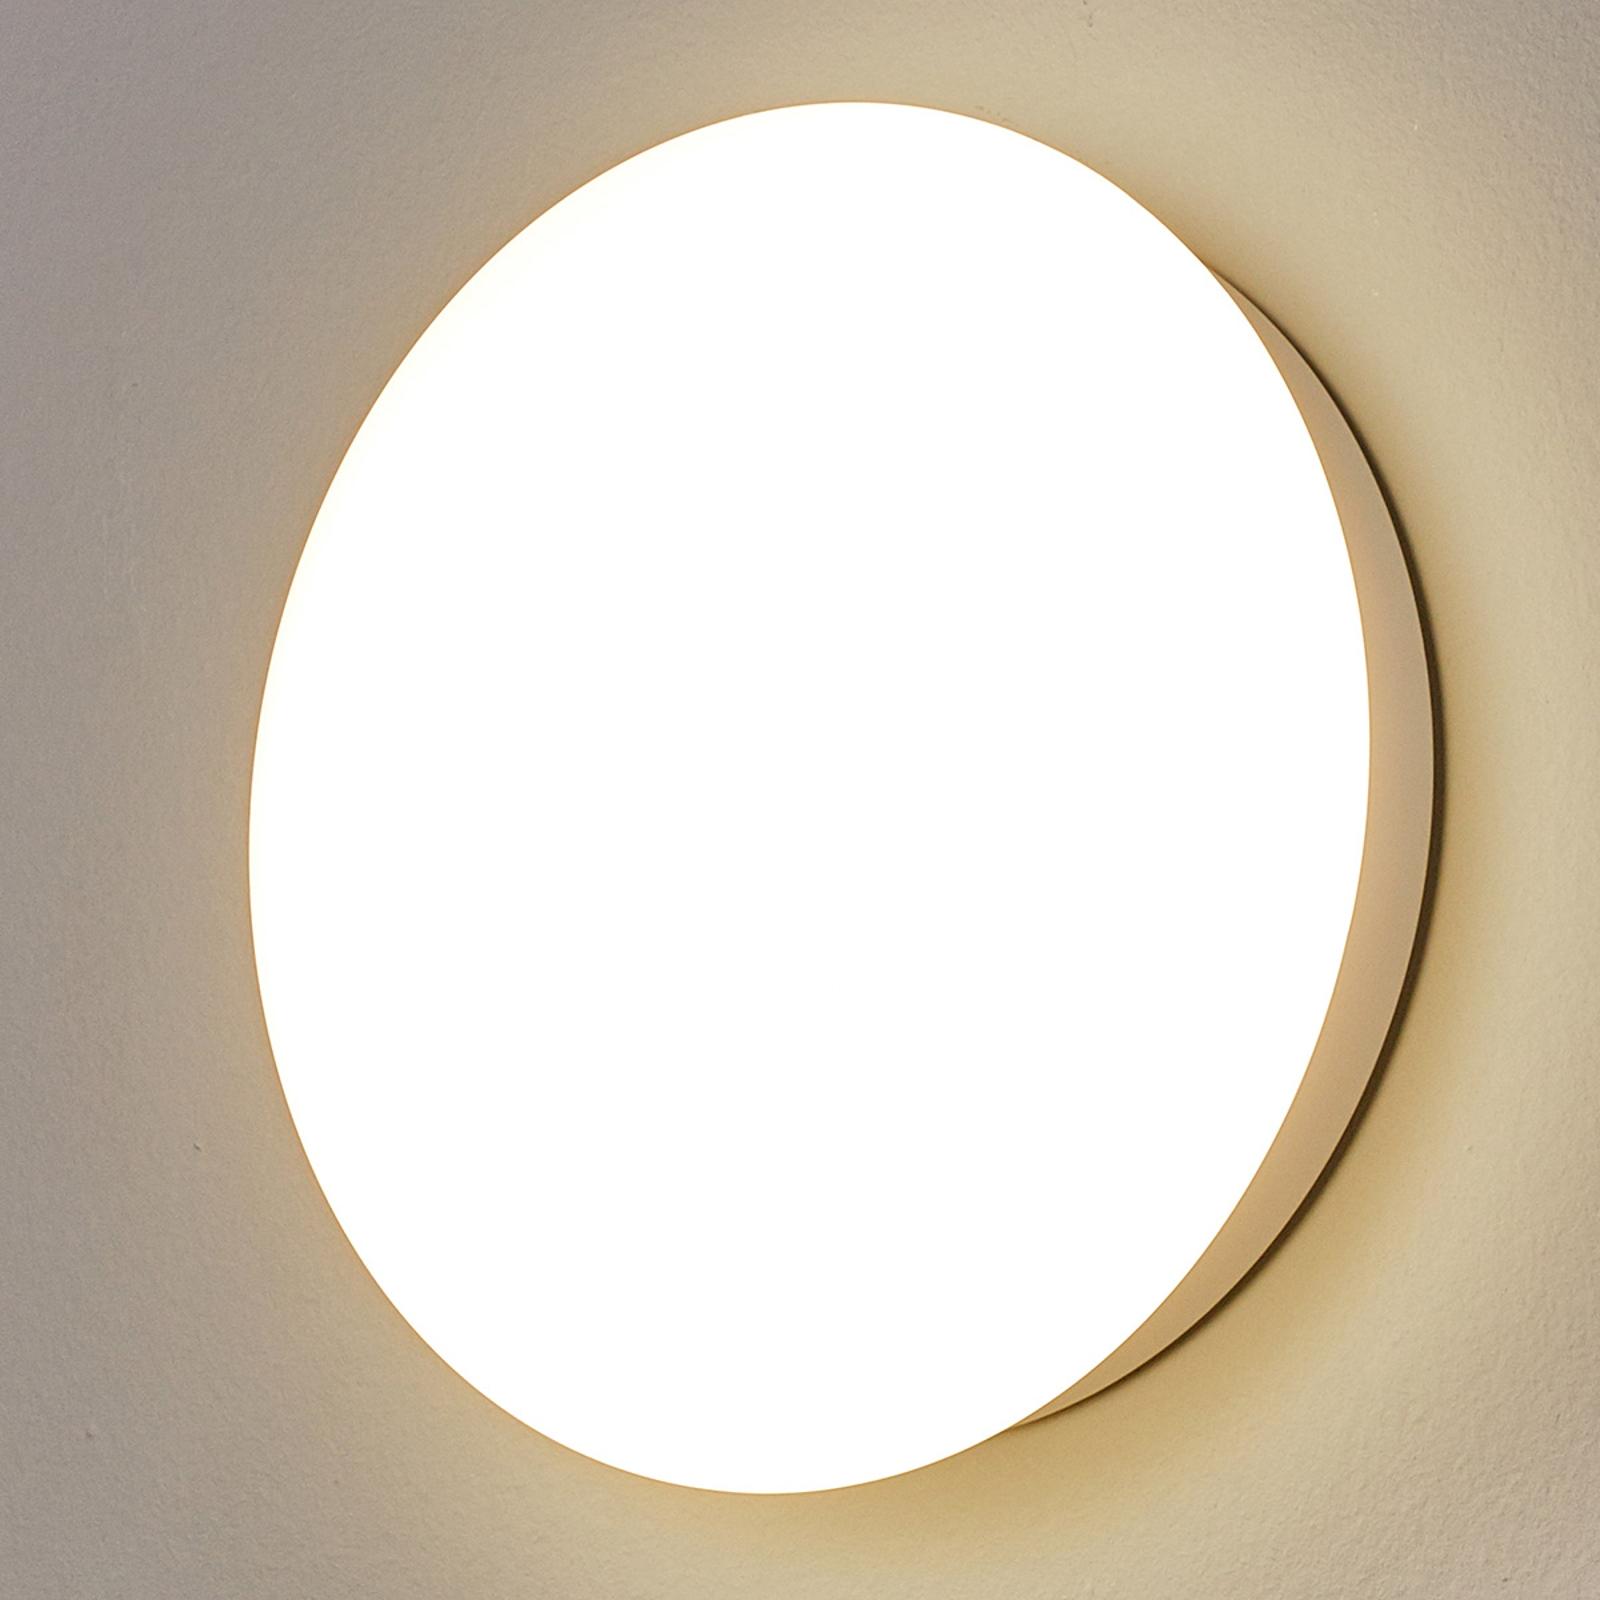 Led-wandlamp SUN 12, IP55, 8W, 3000 K, warmwit